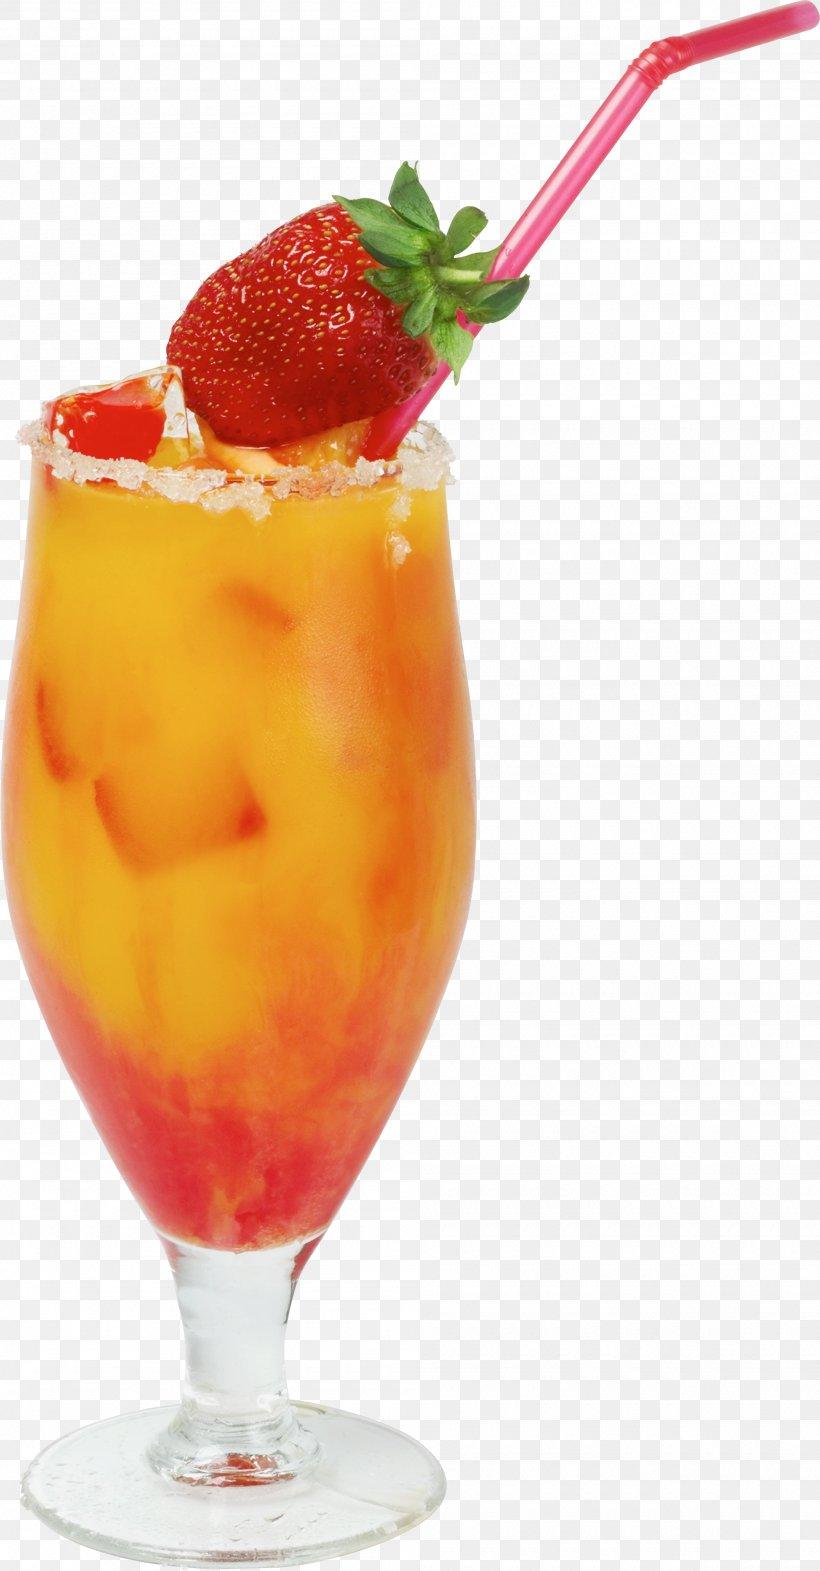 Cocktail Juice Fizzy Drinks Caipiroska Rum And Coke, PNG, 2000x3834px, Cocktail, Alcoholic Drink, Batida, Caipiroska, Cholado Download Free